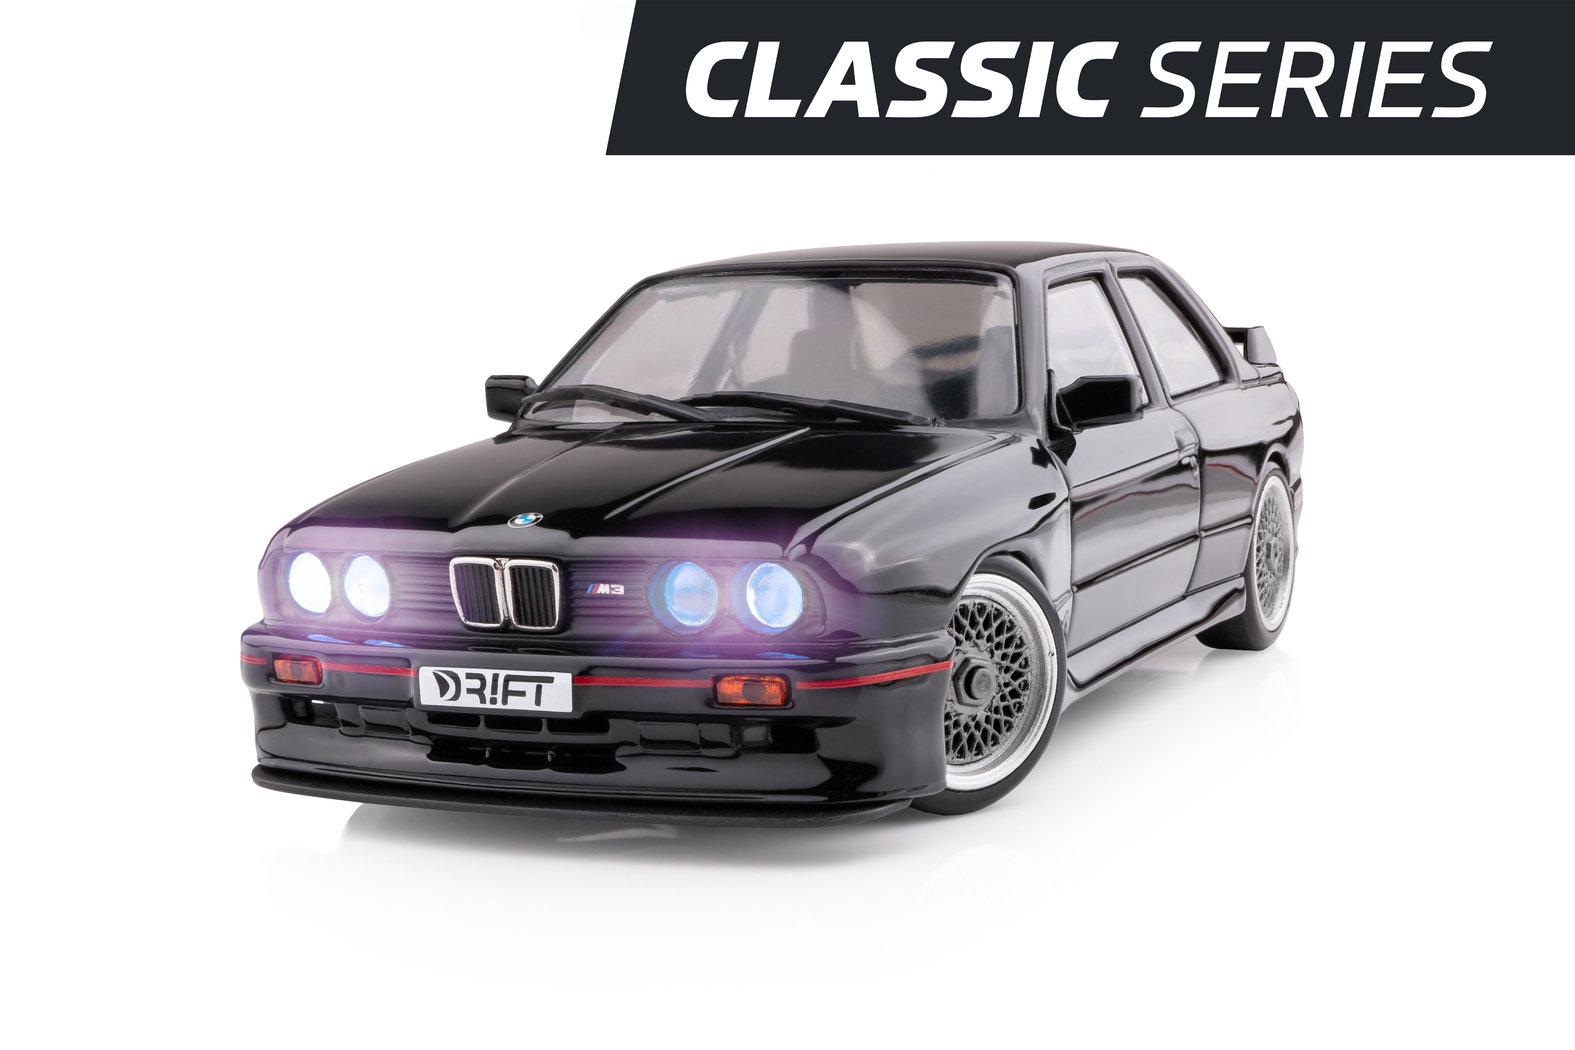 Sturmkind Drift Racer Kaufen Bmw M3 E30 Se 2 5l R4 Rwd